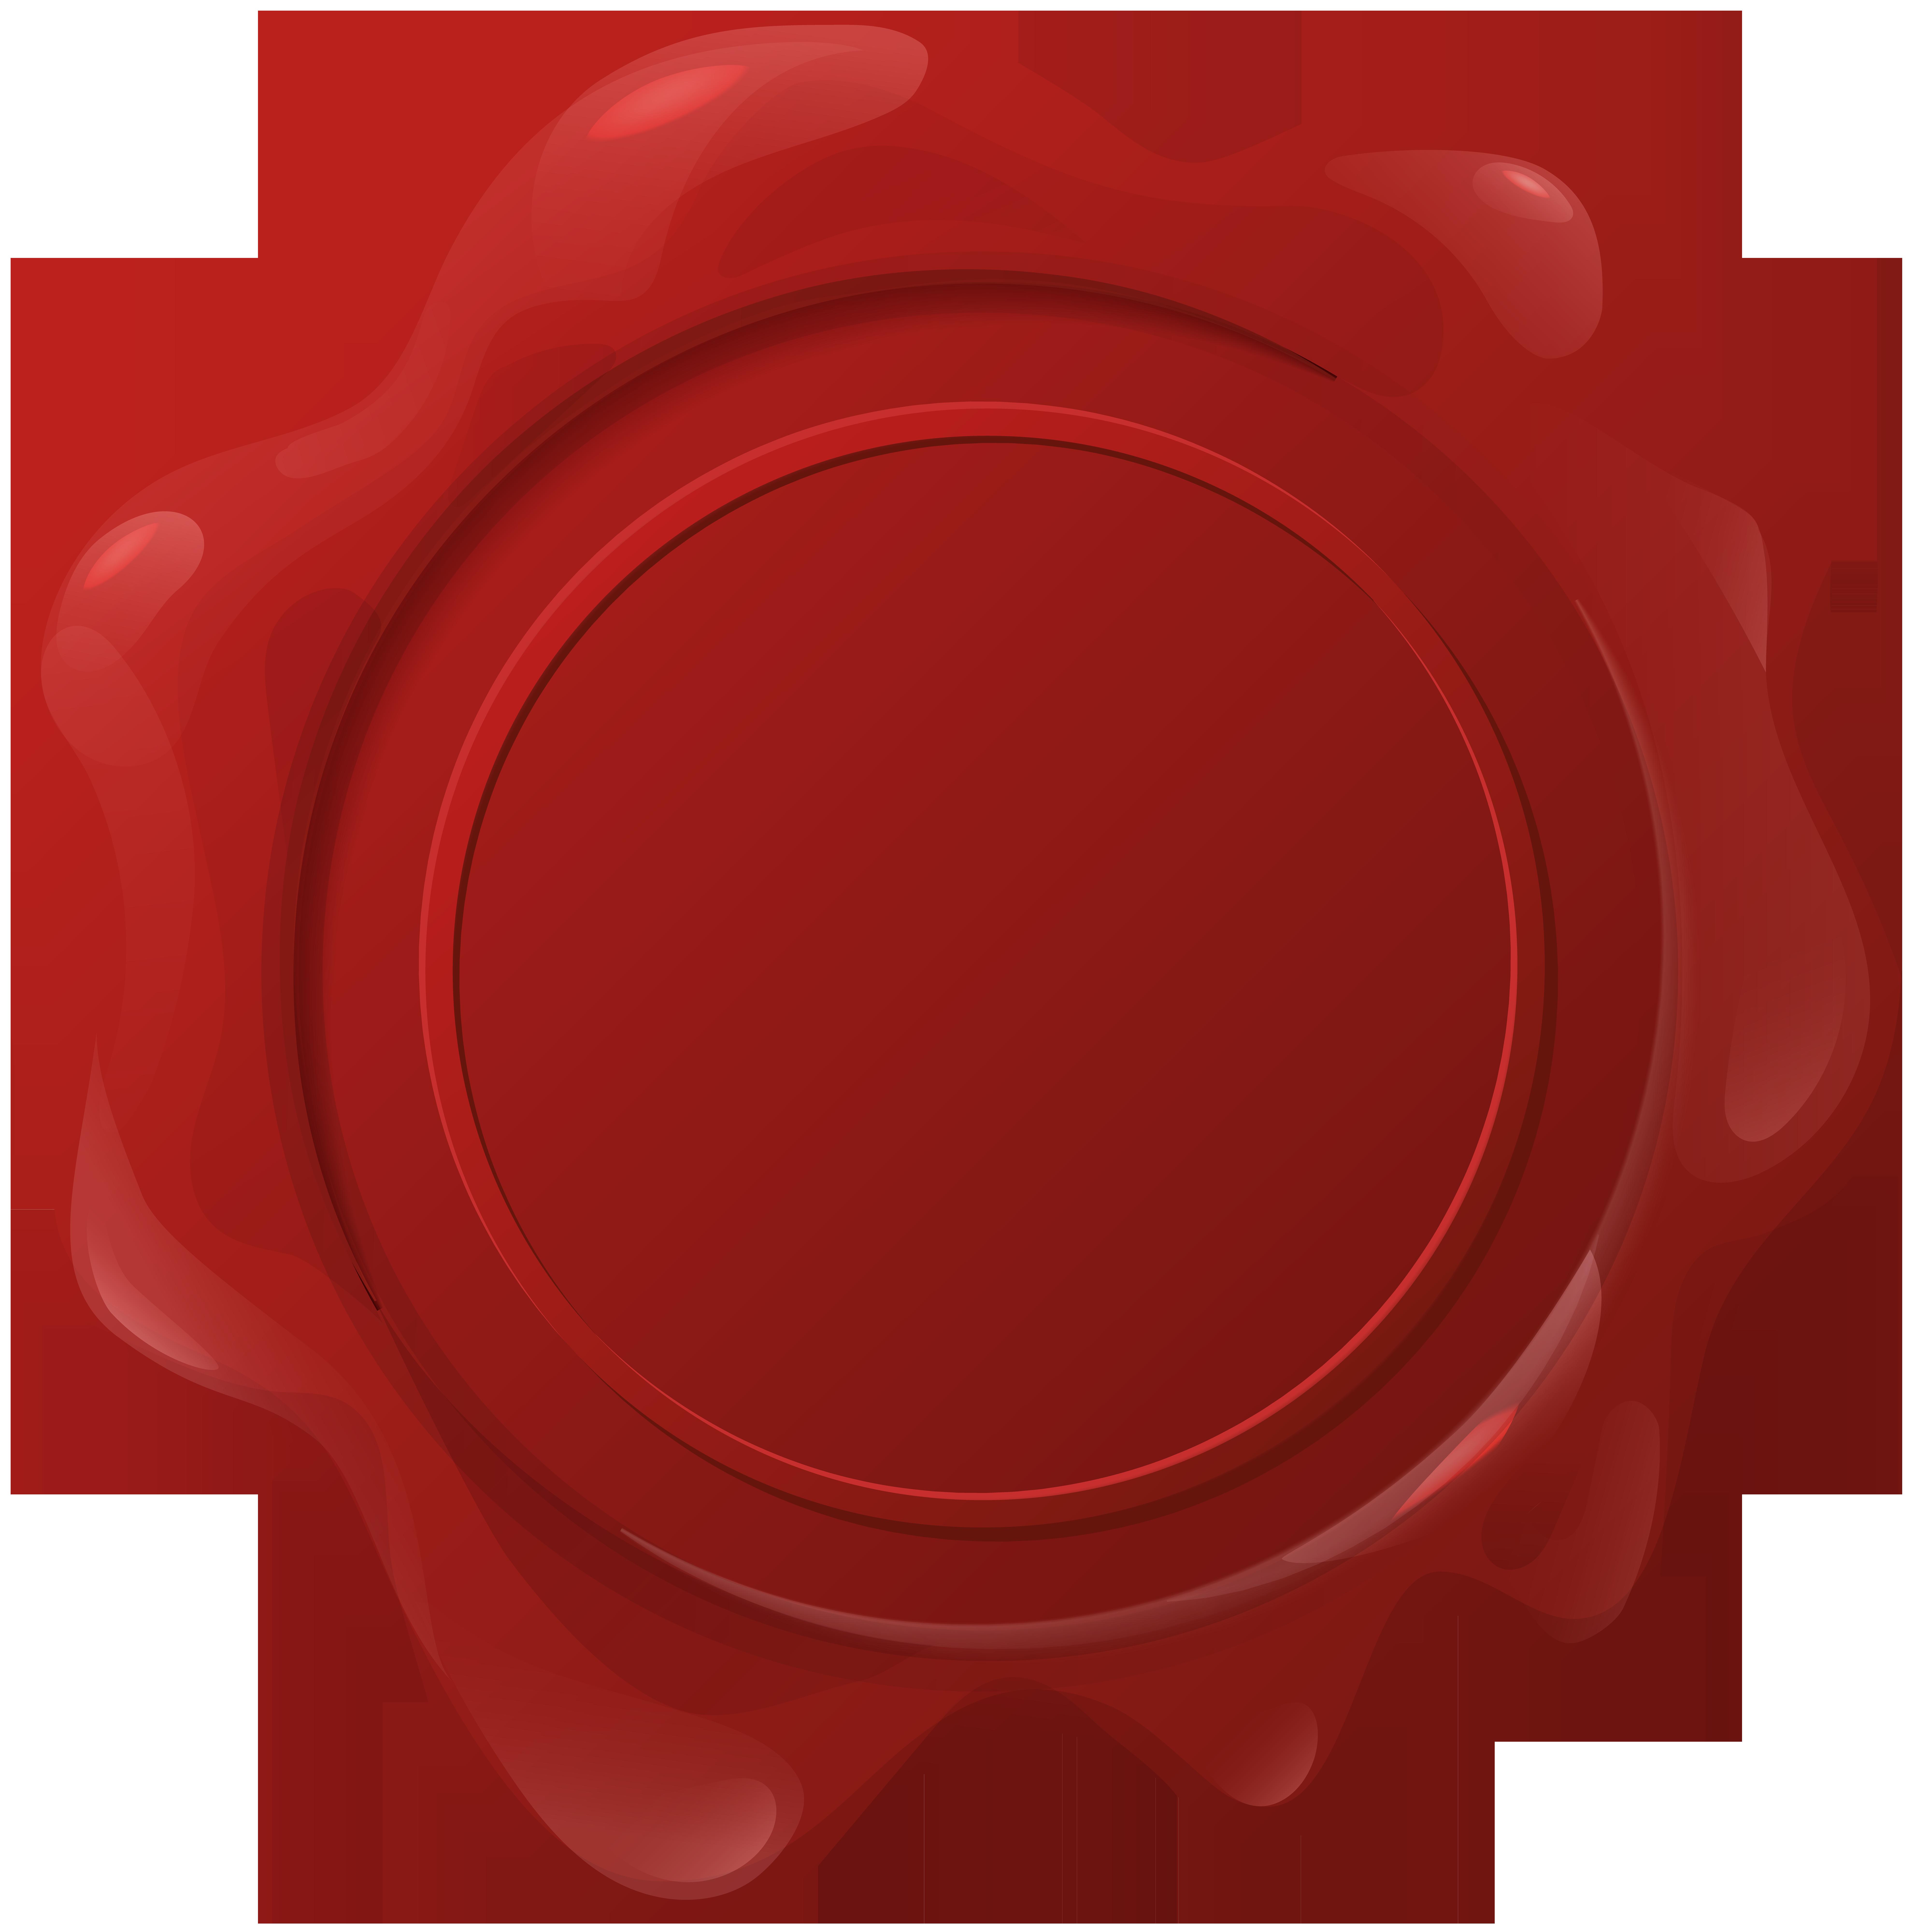 Wax Seal PNG Clip Art Image.